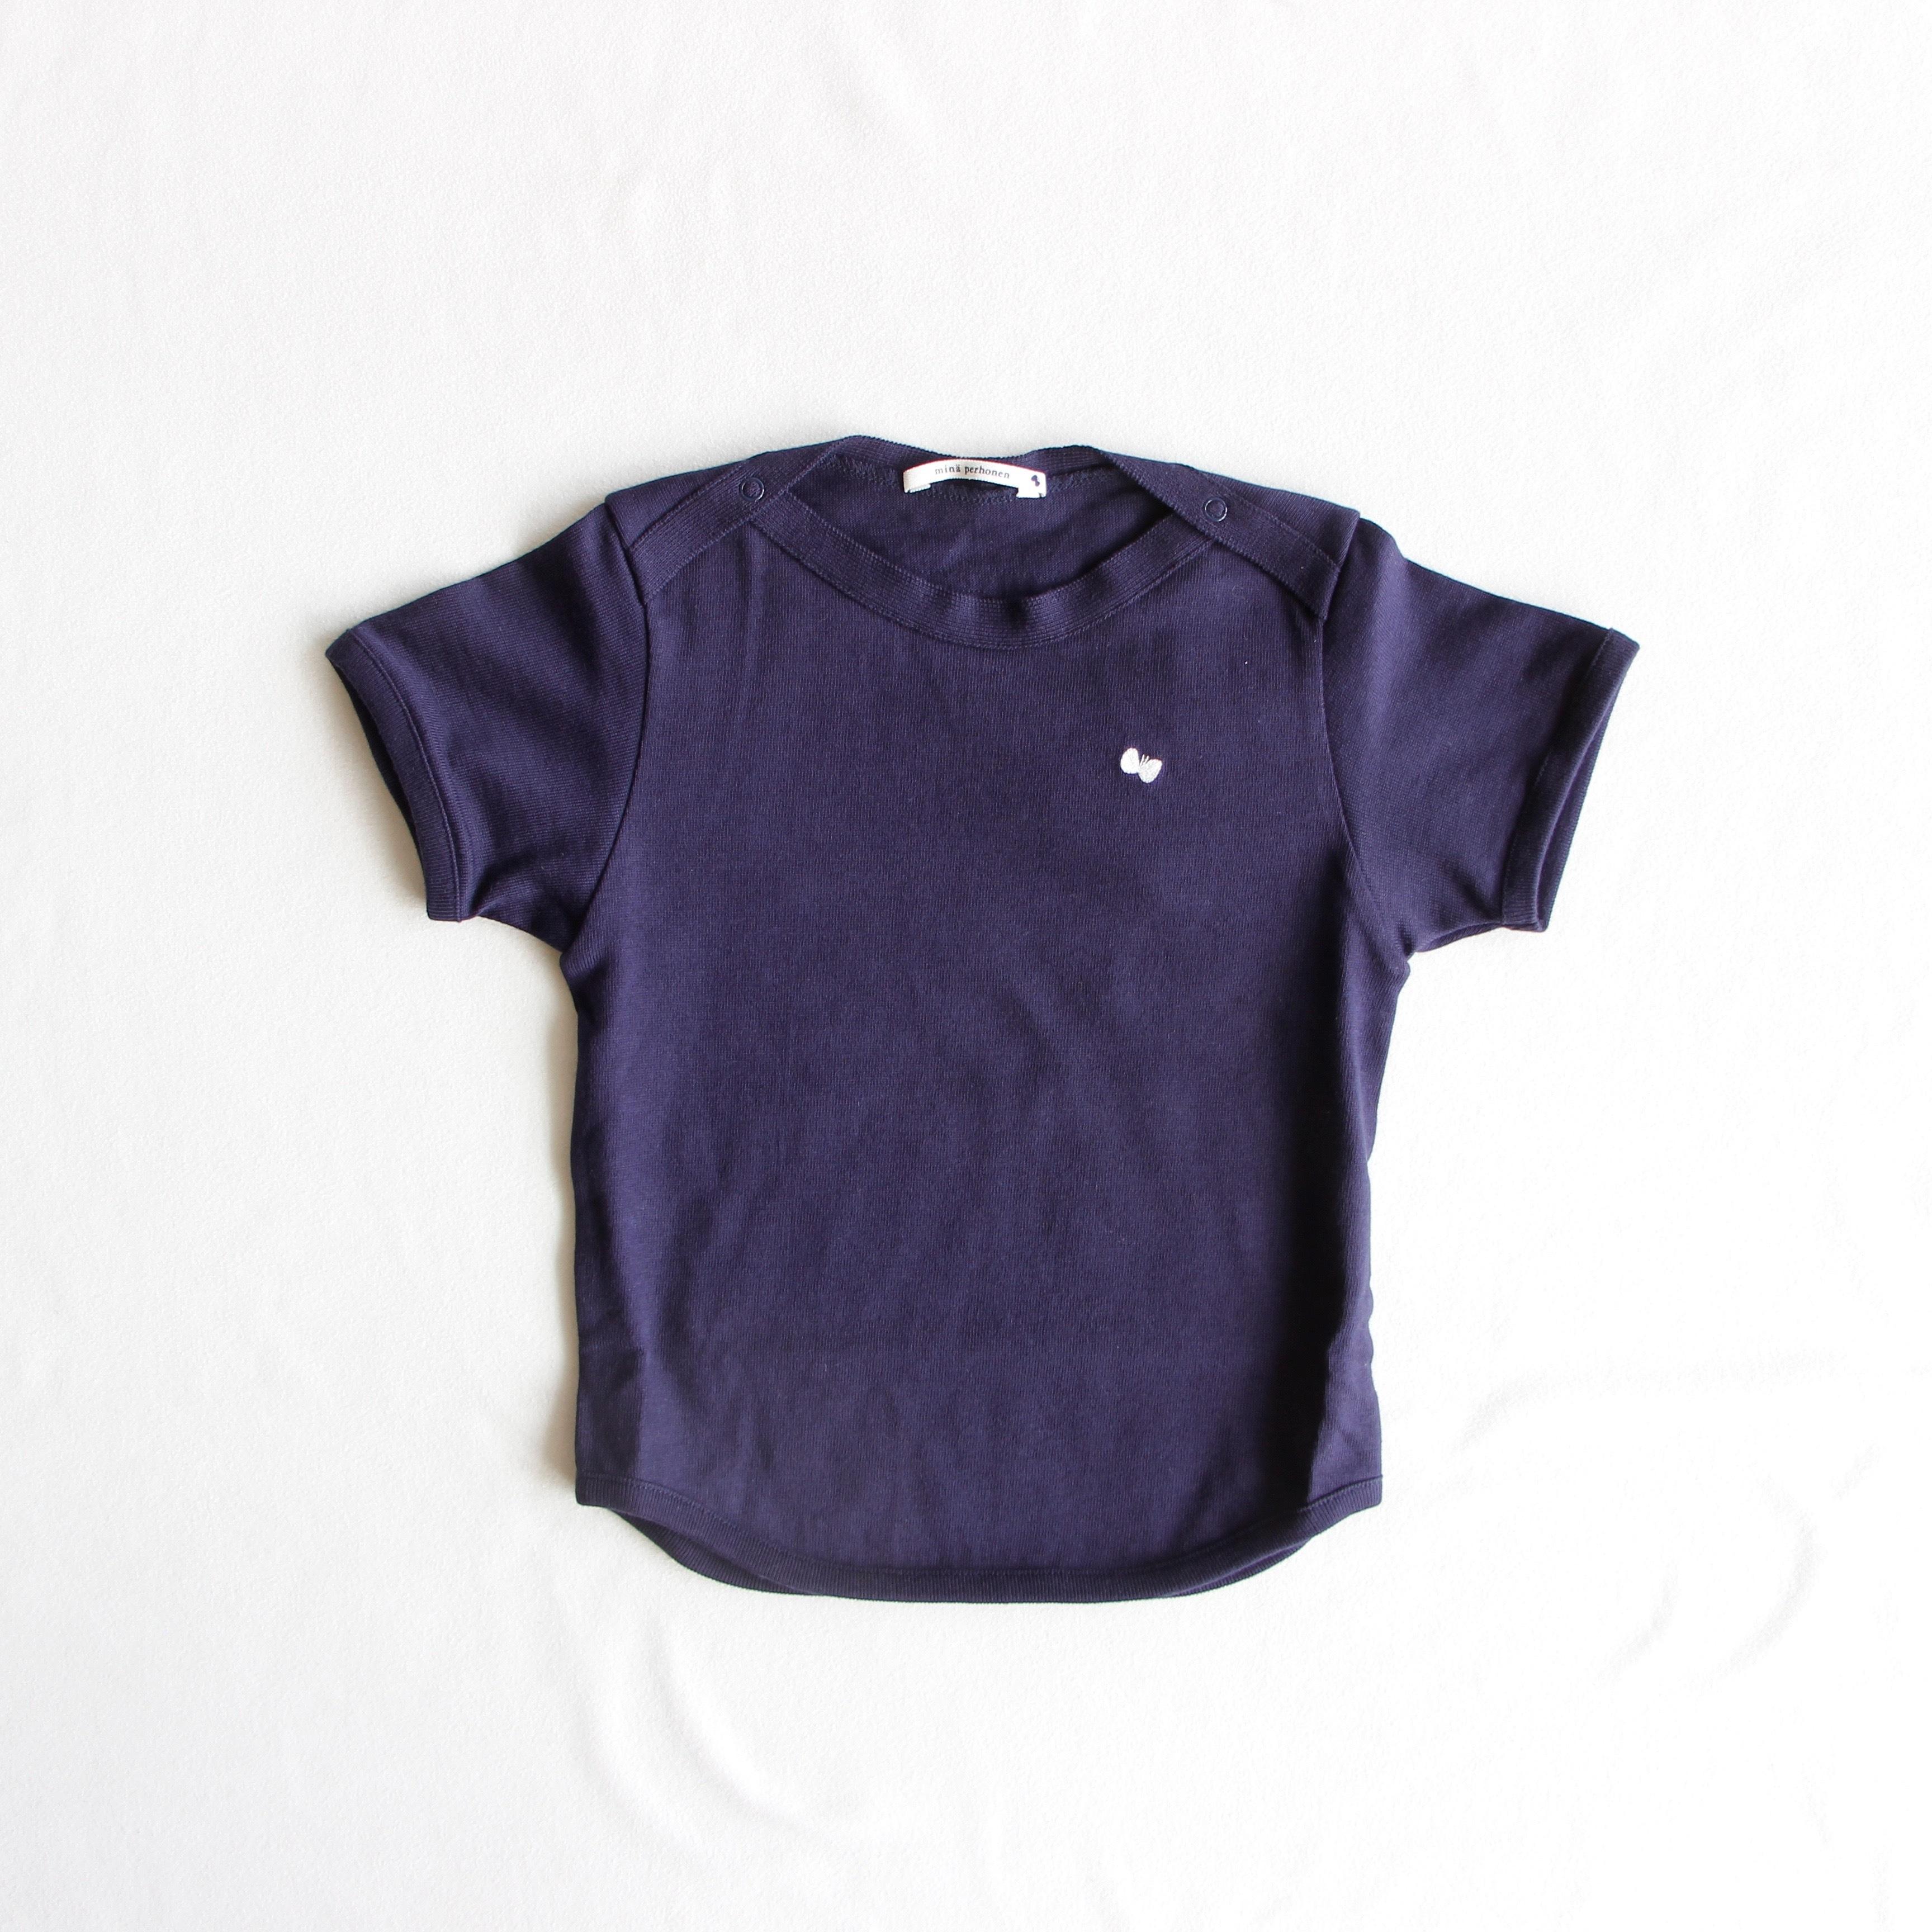 《mina perhonen 2018SS》zutto Tシャツ / navy / 110cm